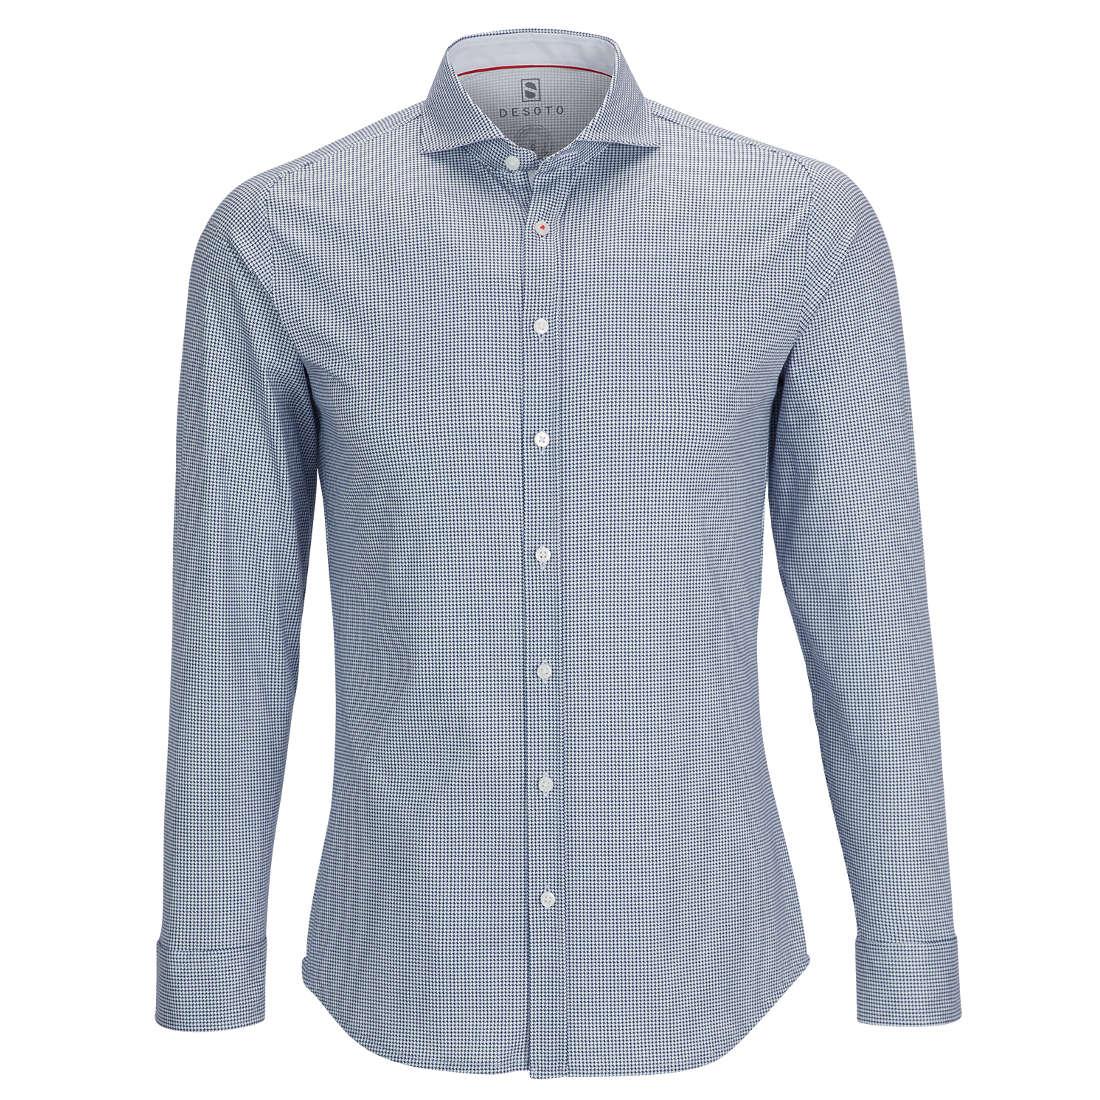 Desoto overhemd Slim Fit 21308-3 in het Donker Blauw